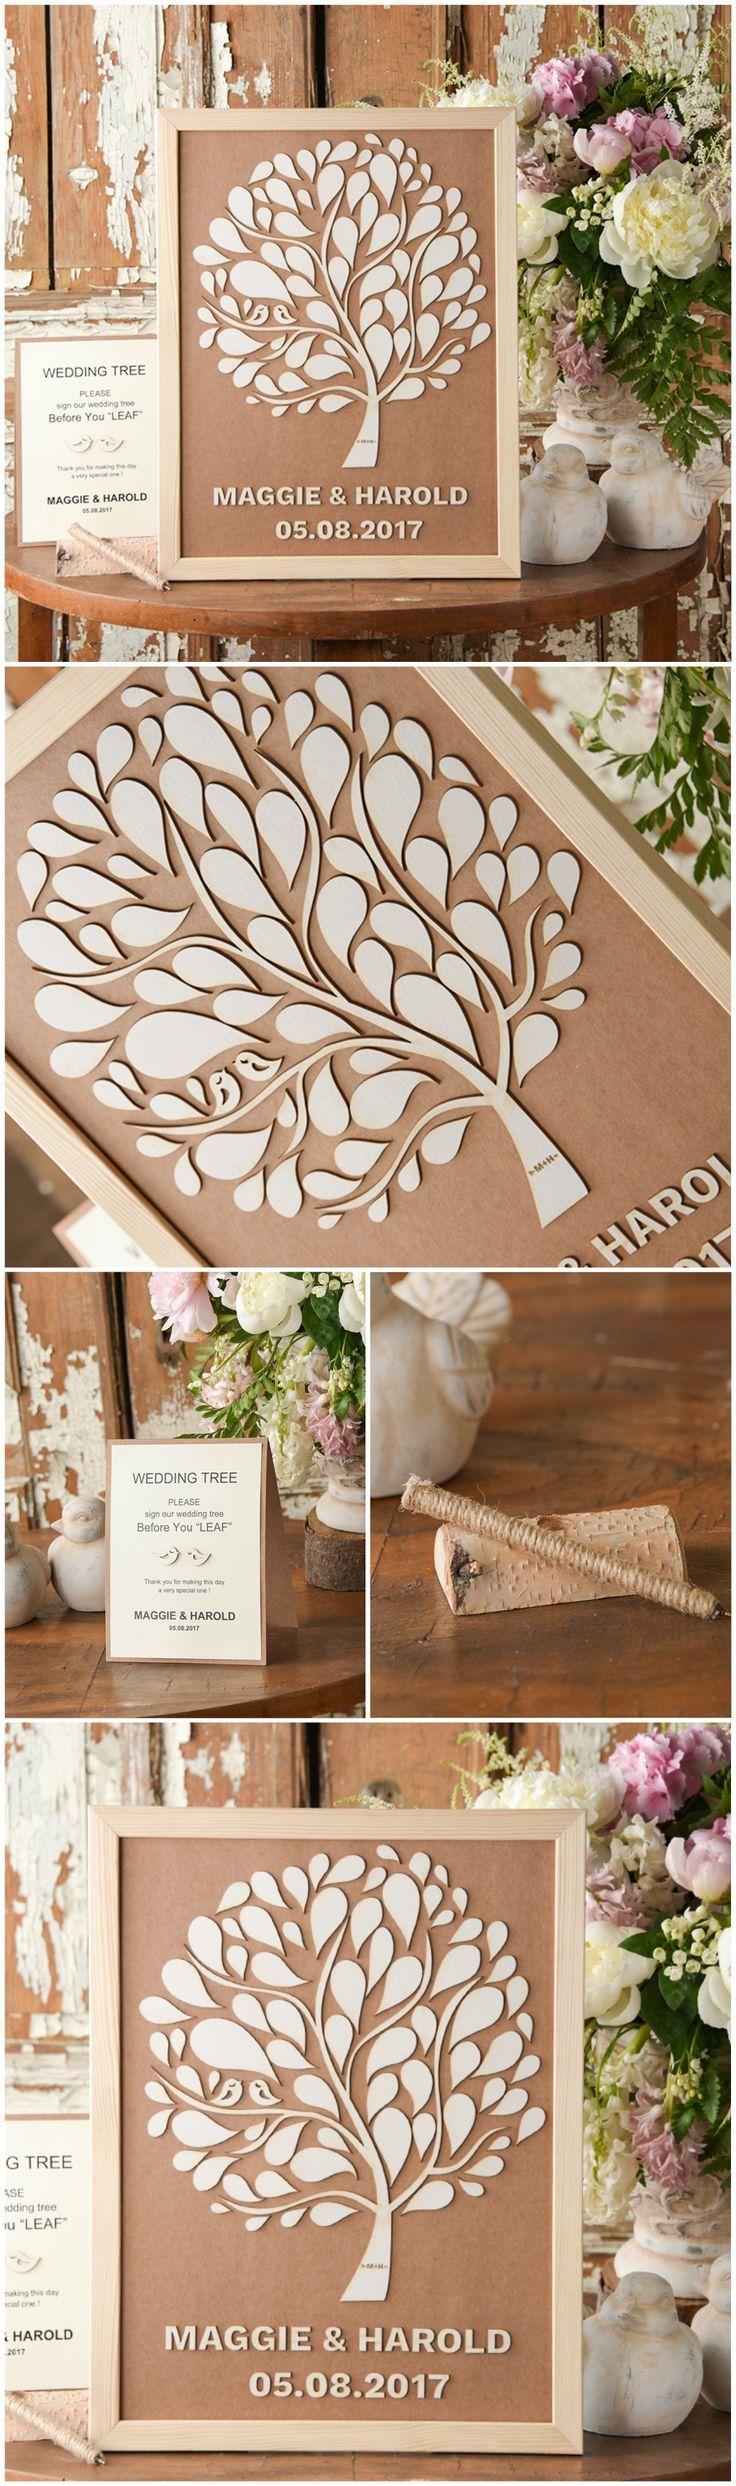 Alternative Tree Wooden Wedding Guest Book Frame #unique #original #alternative #wood #rustic #countrywedding #handmade #tree #lovebirds #dpf